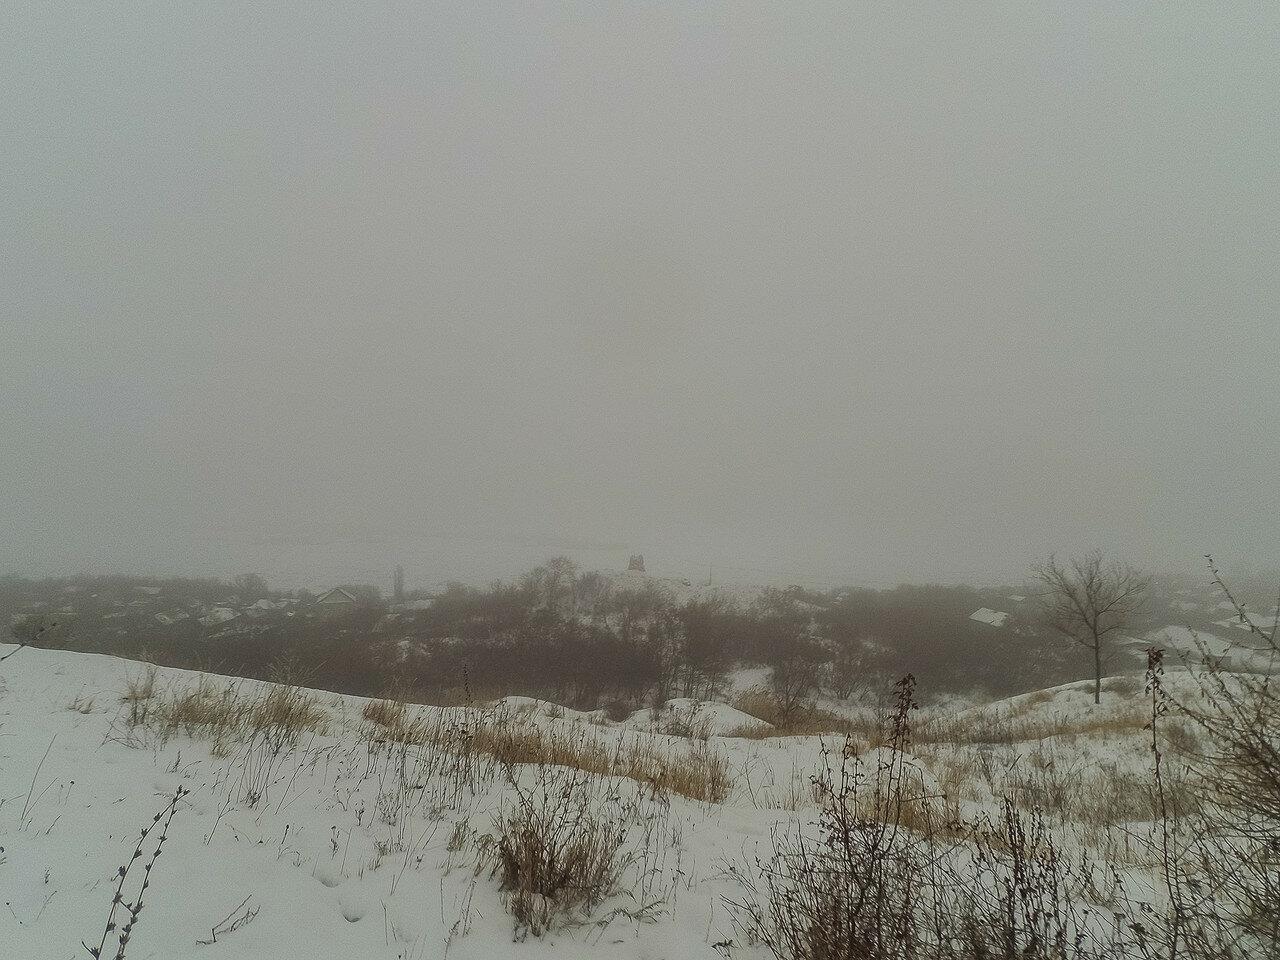 Туманные перспективы фото 10